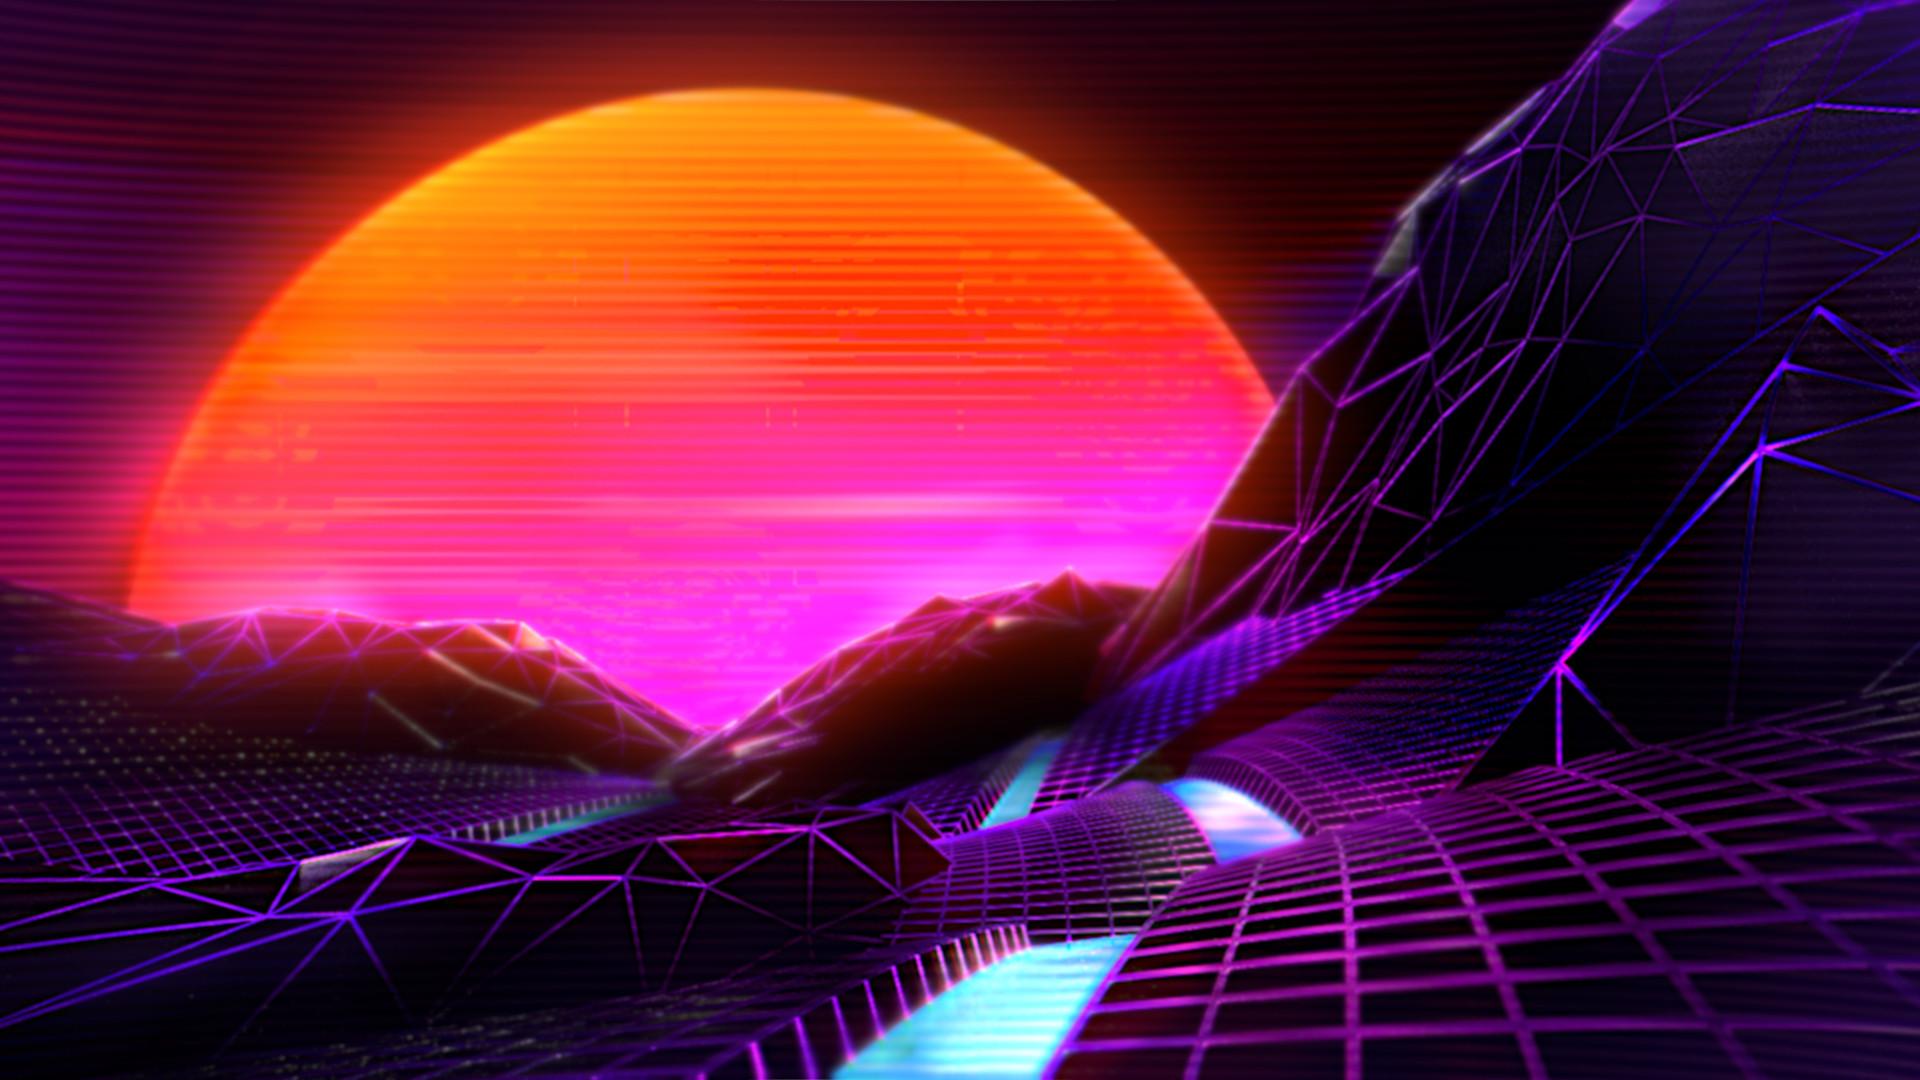 ArtStation - Retrowave | 𝙽𝚞𝚖𝚋𝚎𝚛 02, // Janovich //